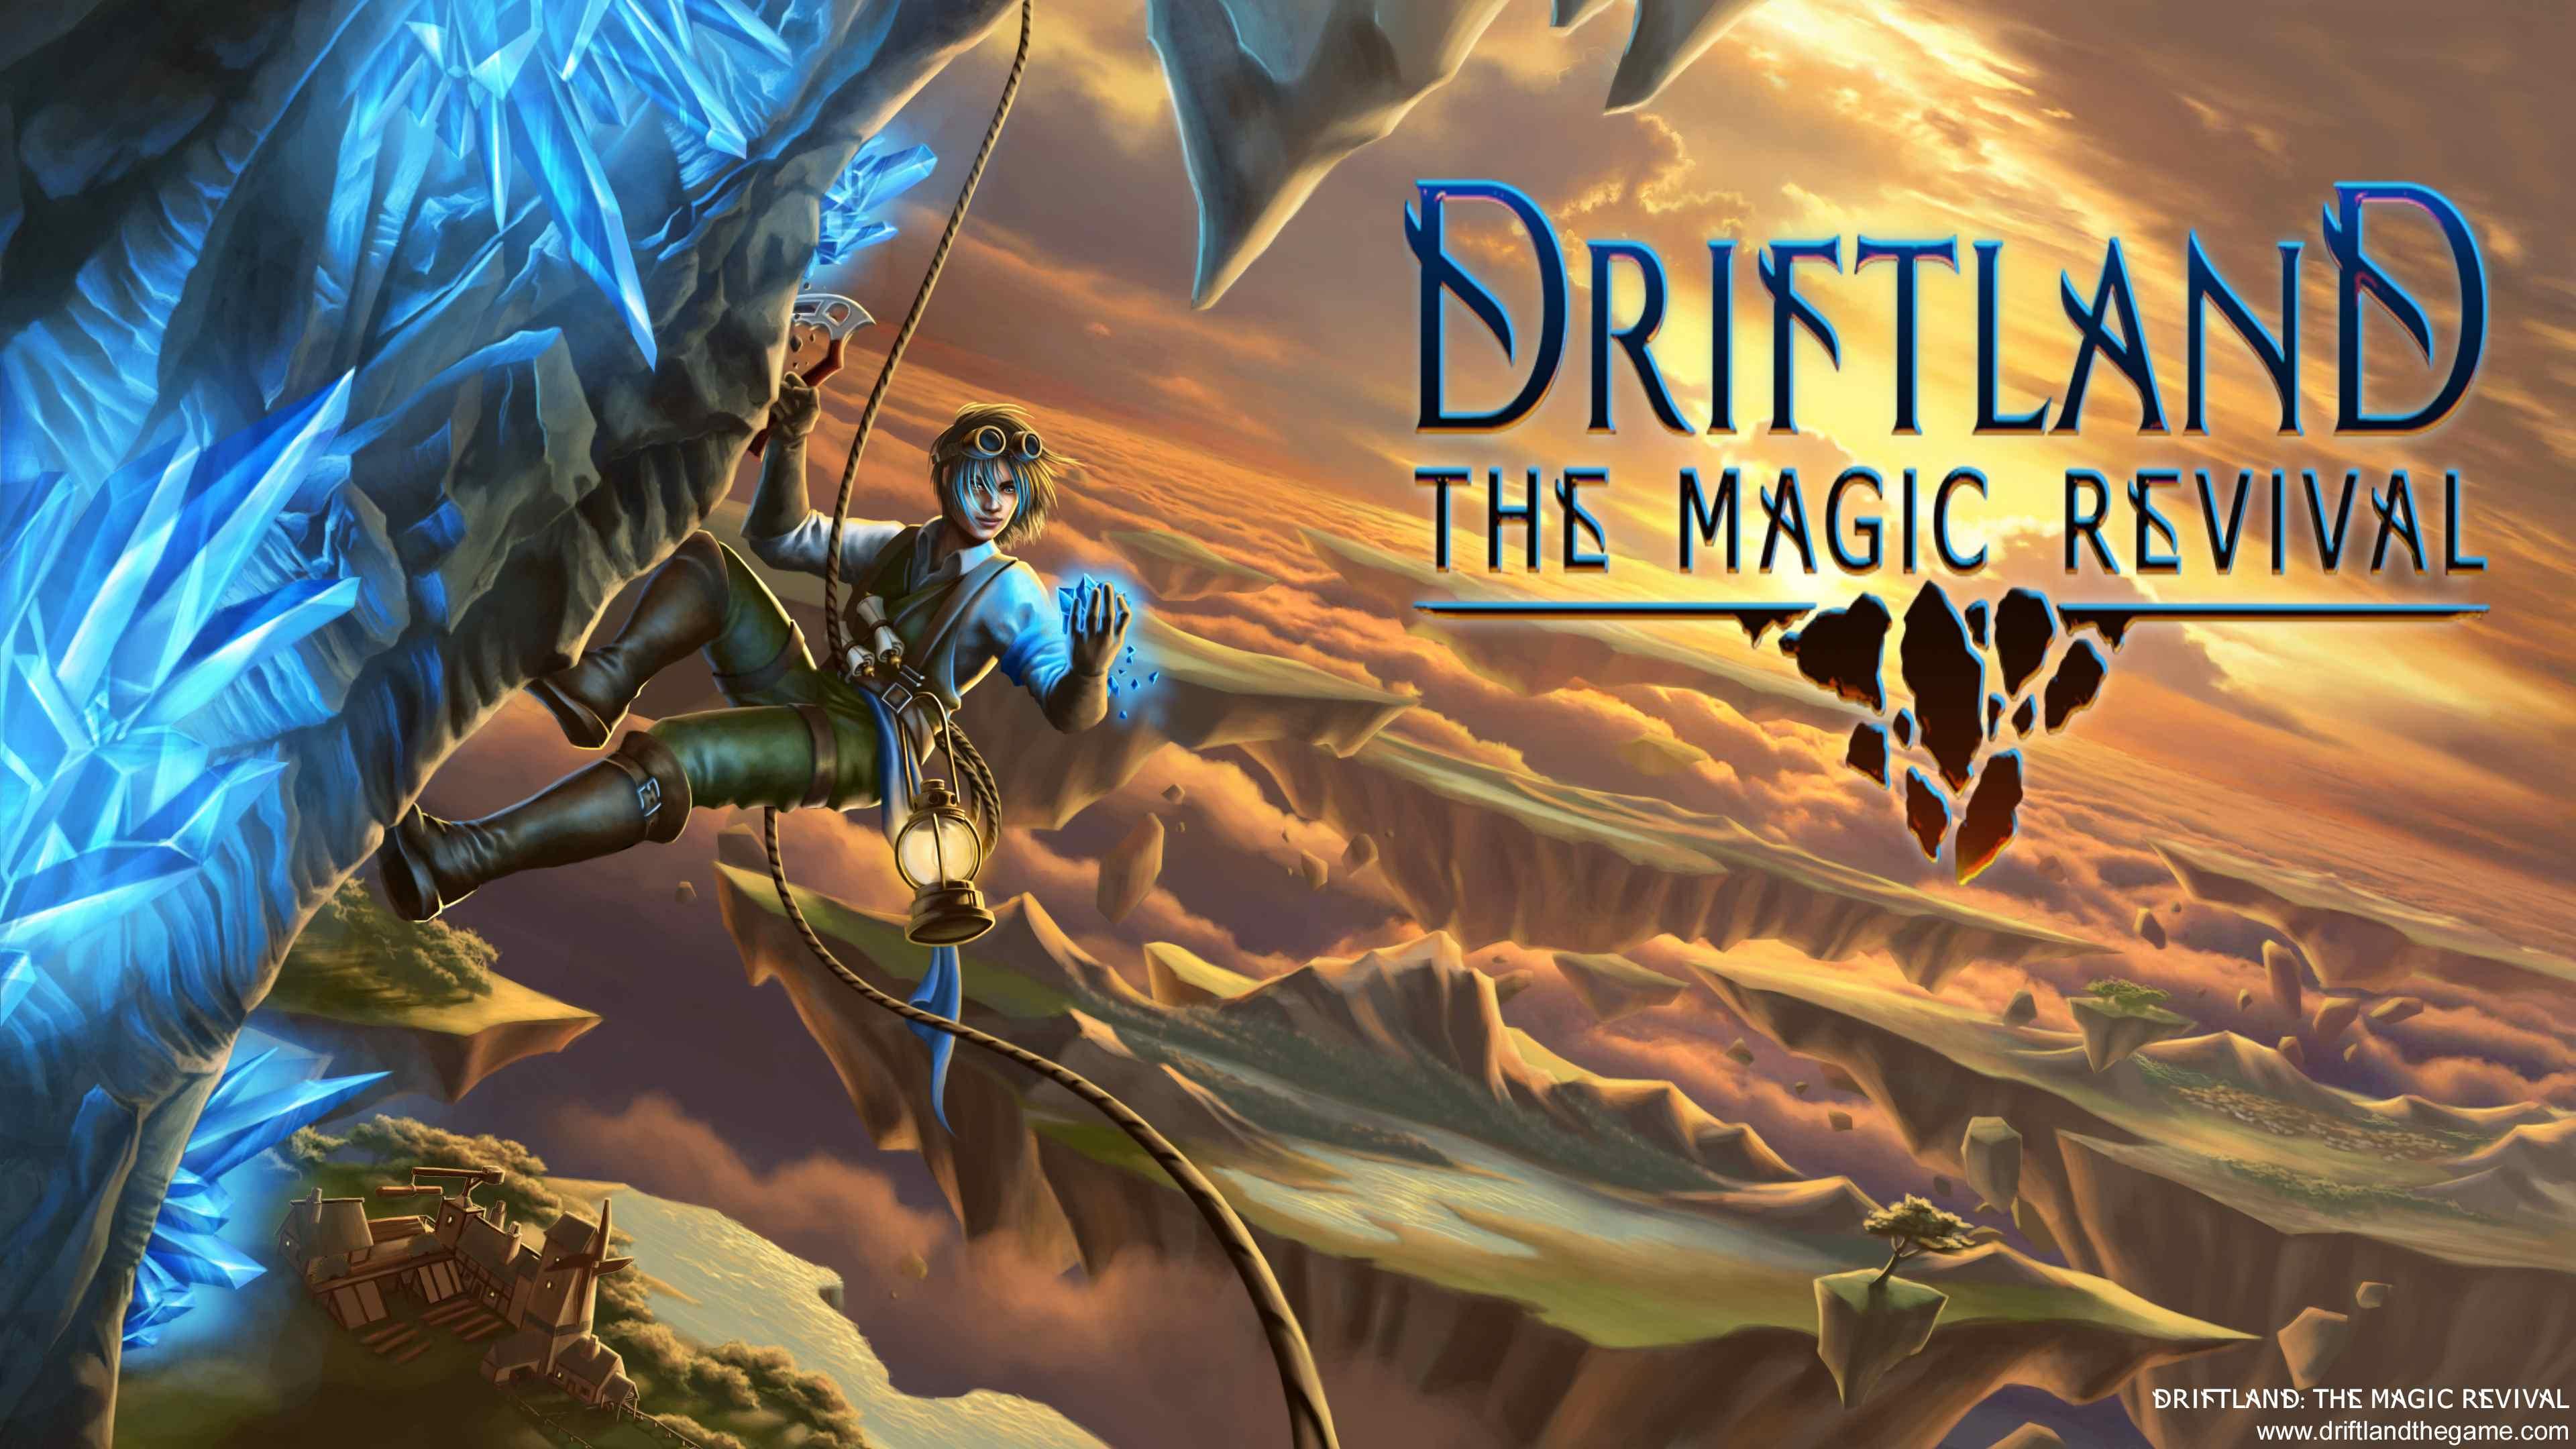 Preview Vidéo : Driftland The Magic Revival